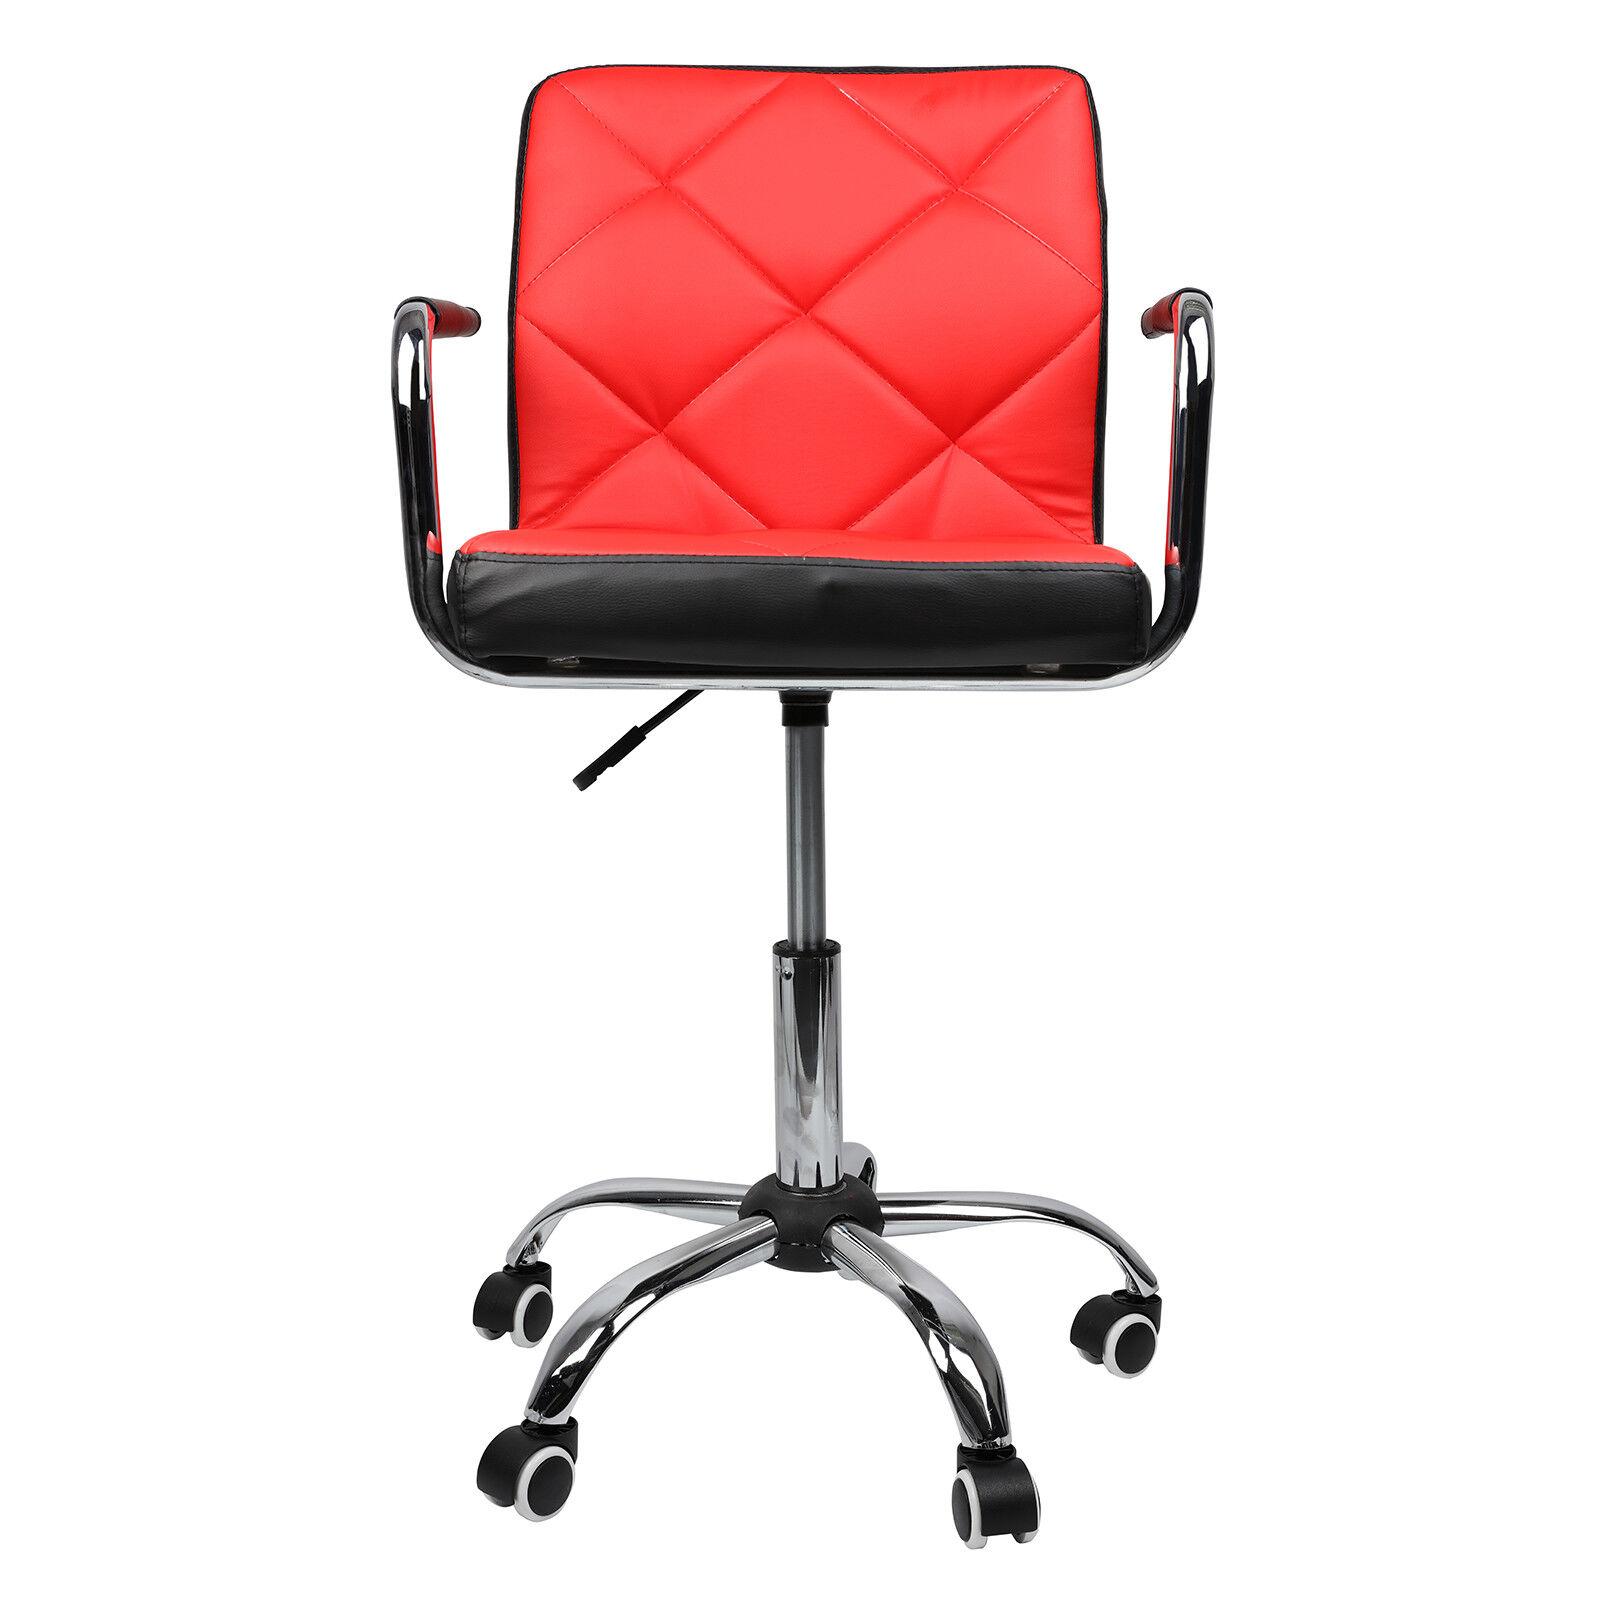 Comfort Swivel Bar Stools Chrome Home Office Computer Chair